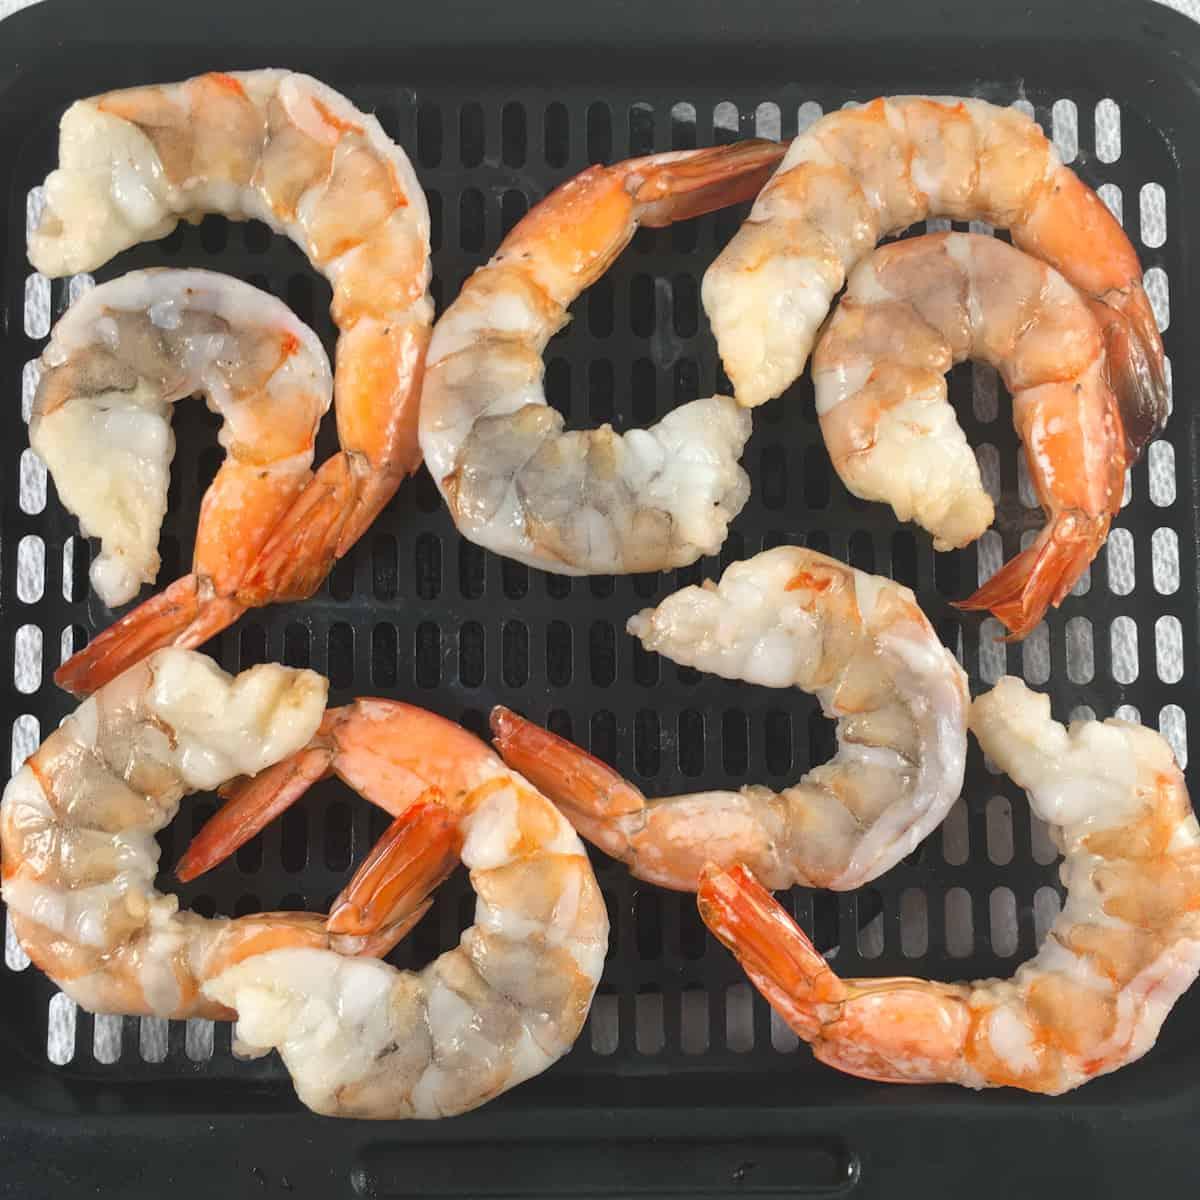 shrimp in air fryer